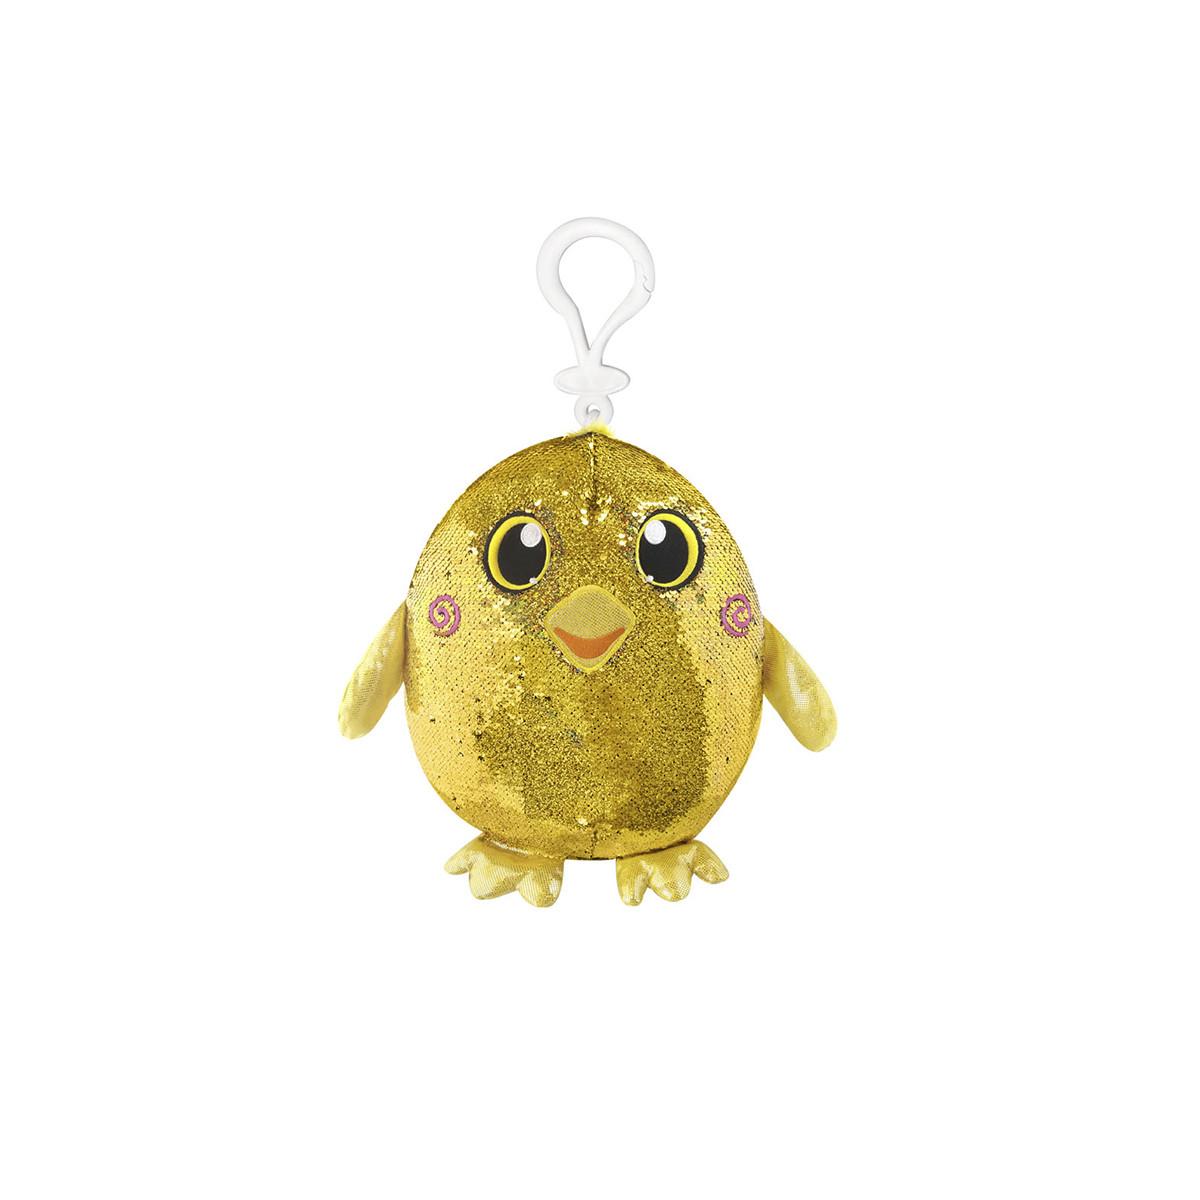 М'яка іграшка з паєтками SHIMMEEZ – РАДІСНА КАЧЕЧКА (9 см, на кліпсі), SMZ01000Du